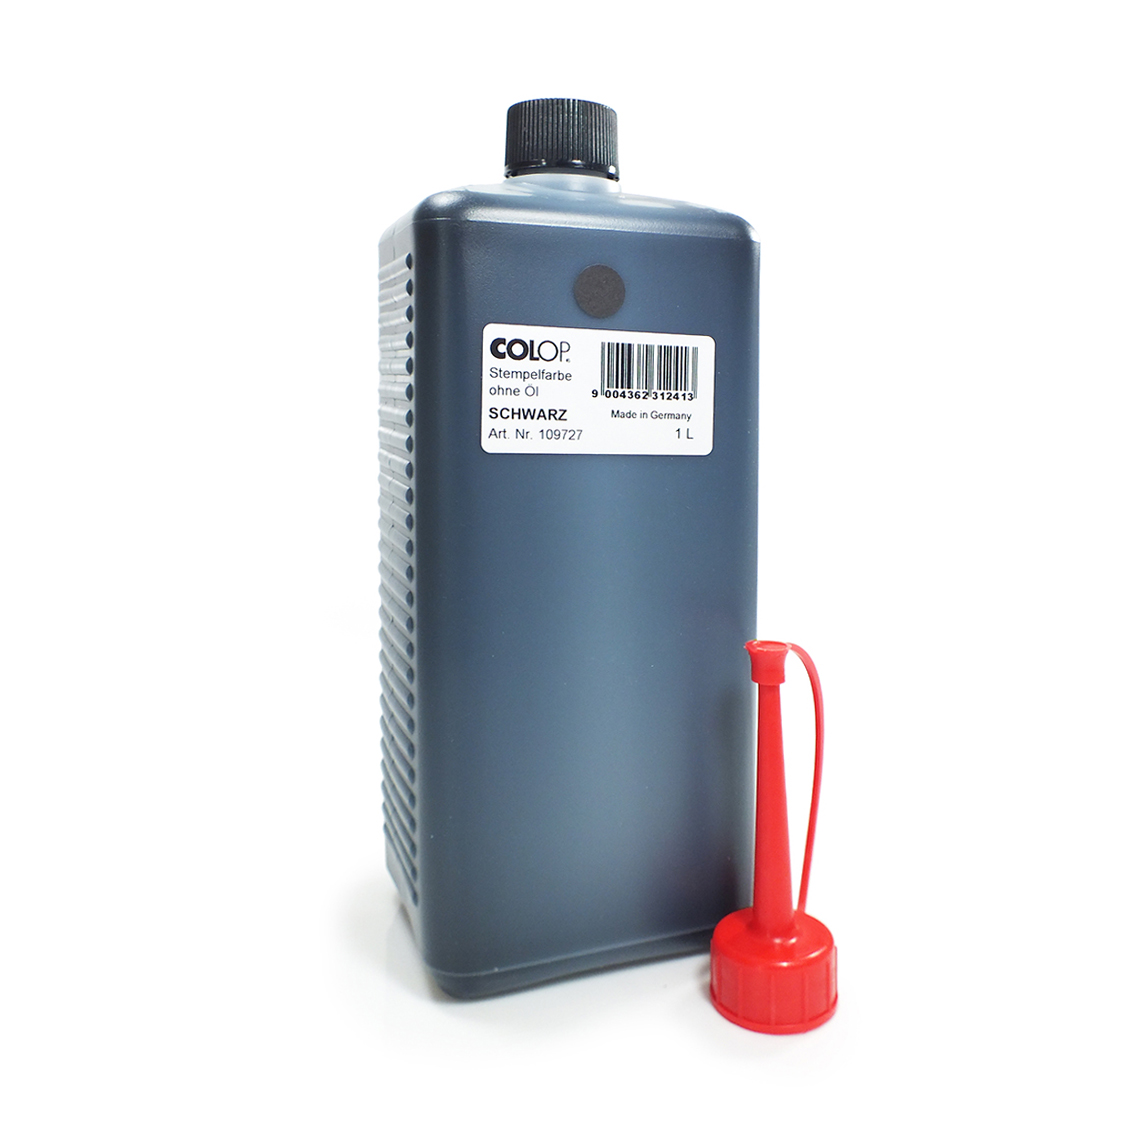 TINTA COLOP 801 Litro